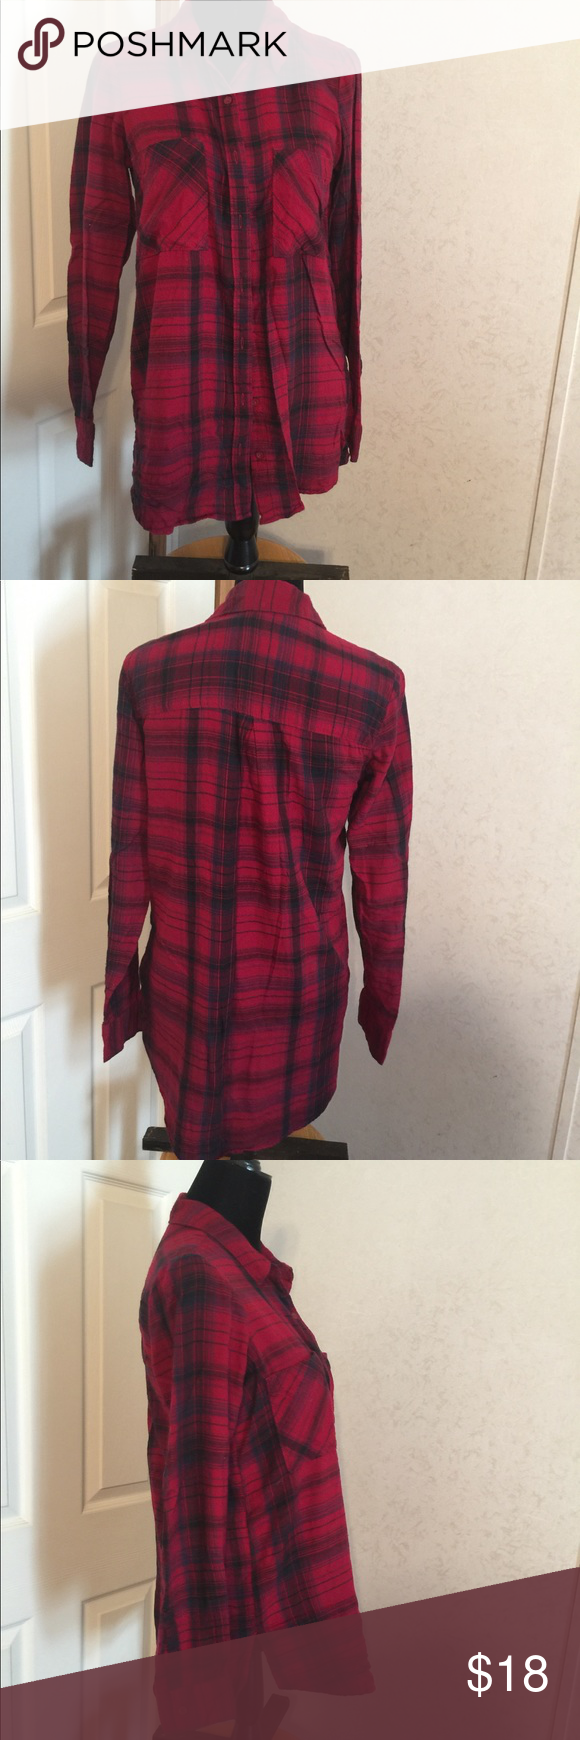 Flannel shirt season  Mudd Red Flannel Shirt Size Medium  Red flannel shirt Red flannel